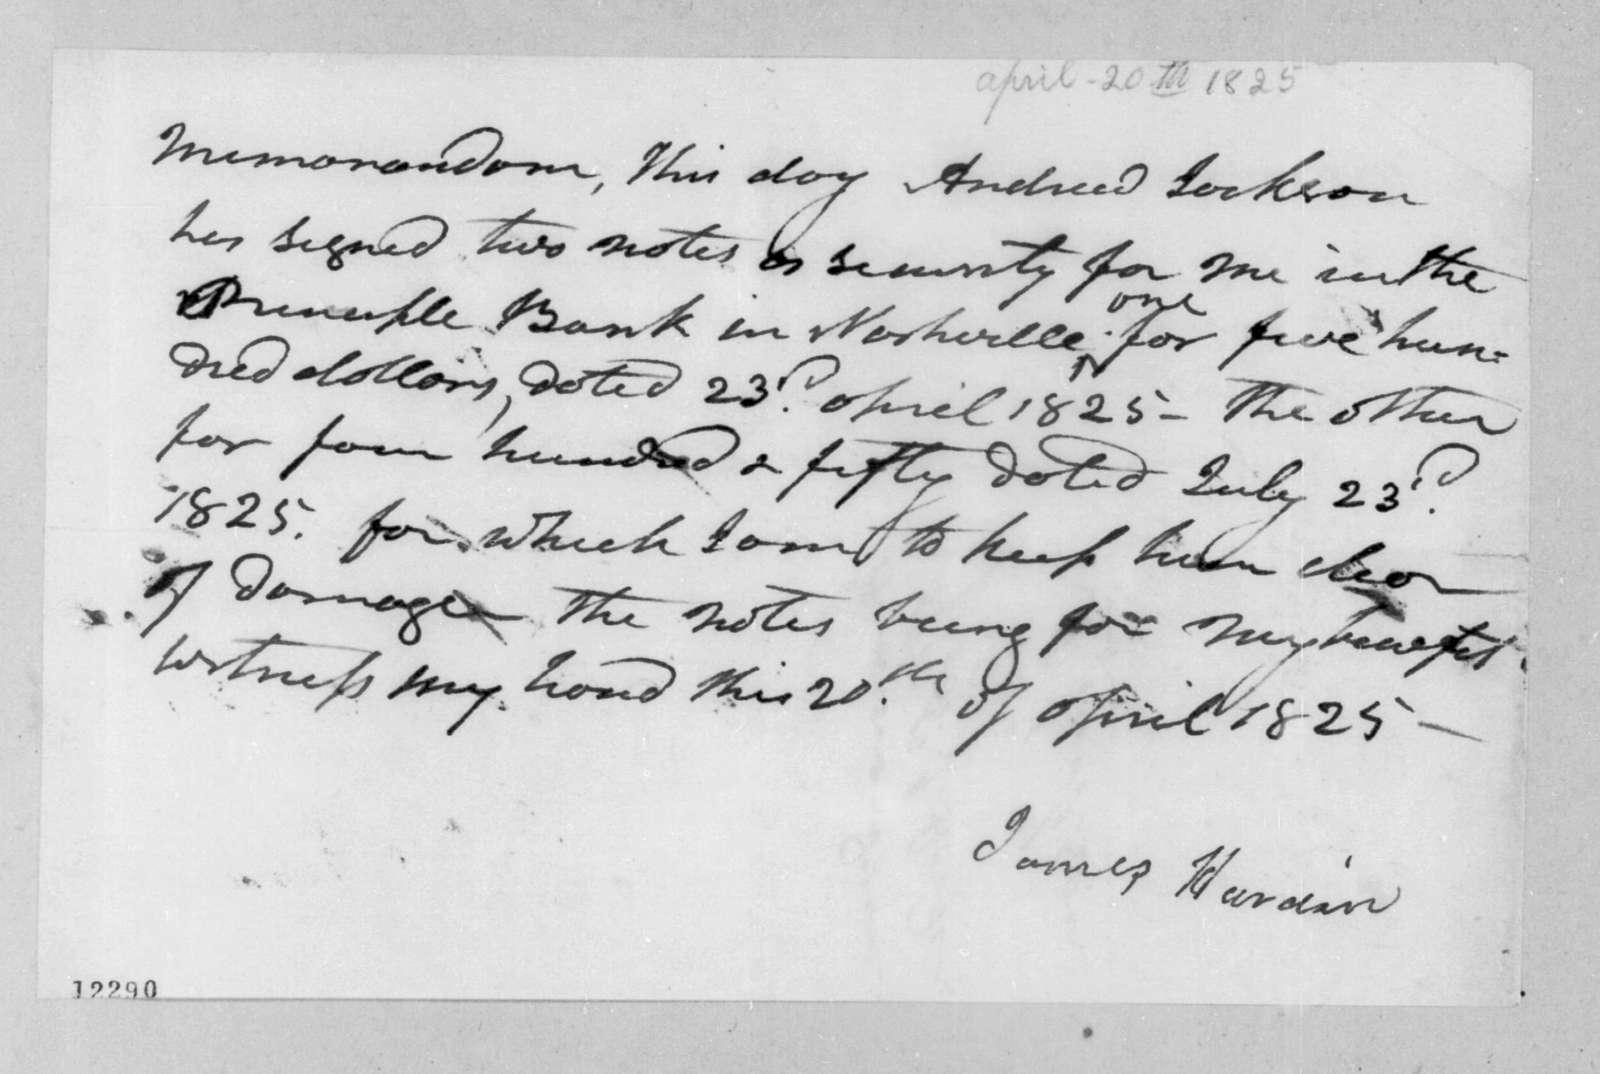 James Hardin, April 20, 1825